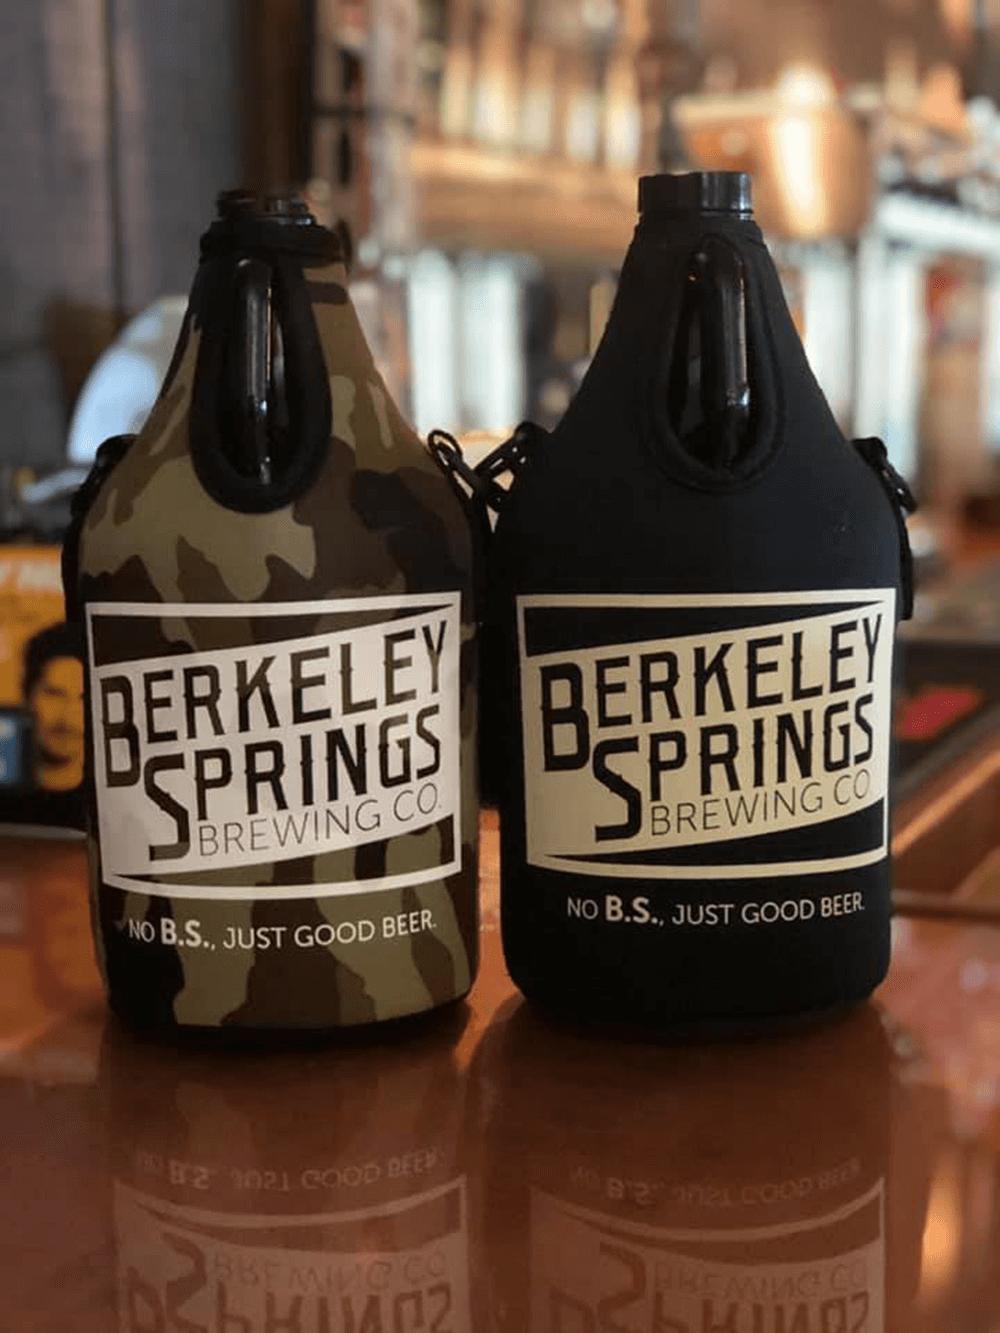 berkeley springs brewing company logo on growlers